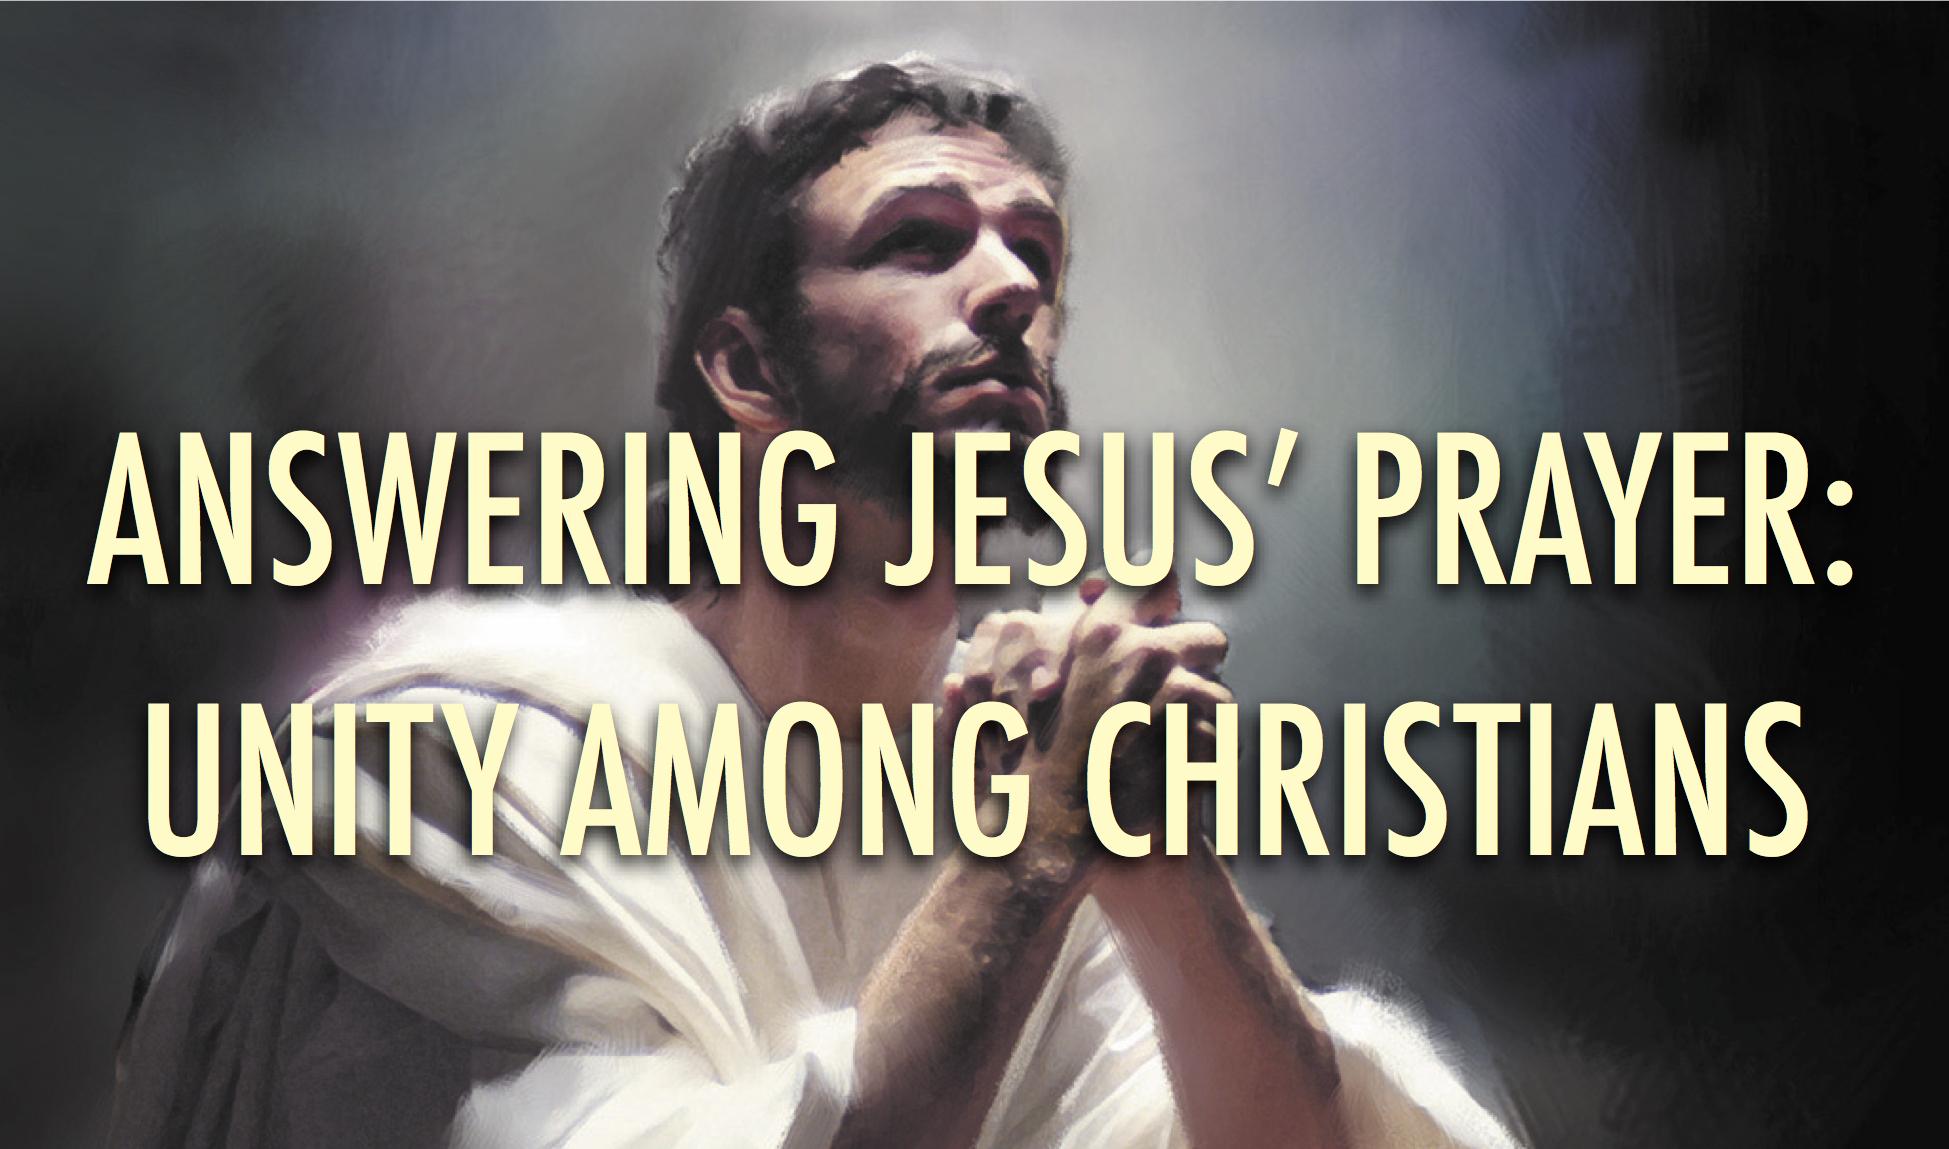 Answering Jesus' Prayer: Unity Among Christians | The Doc File